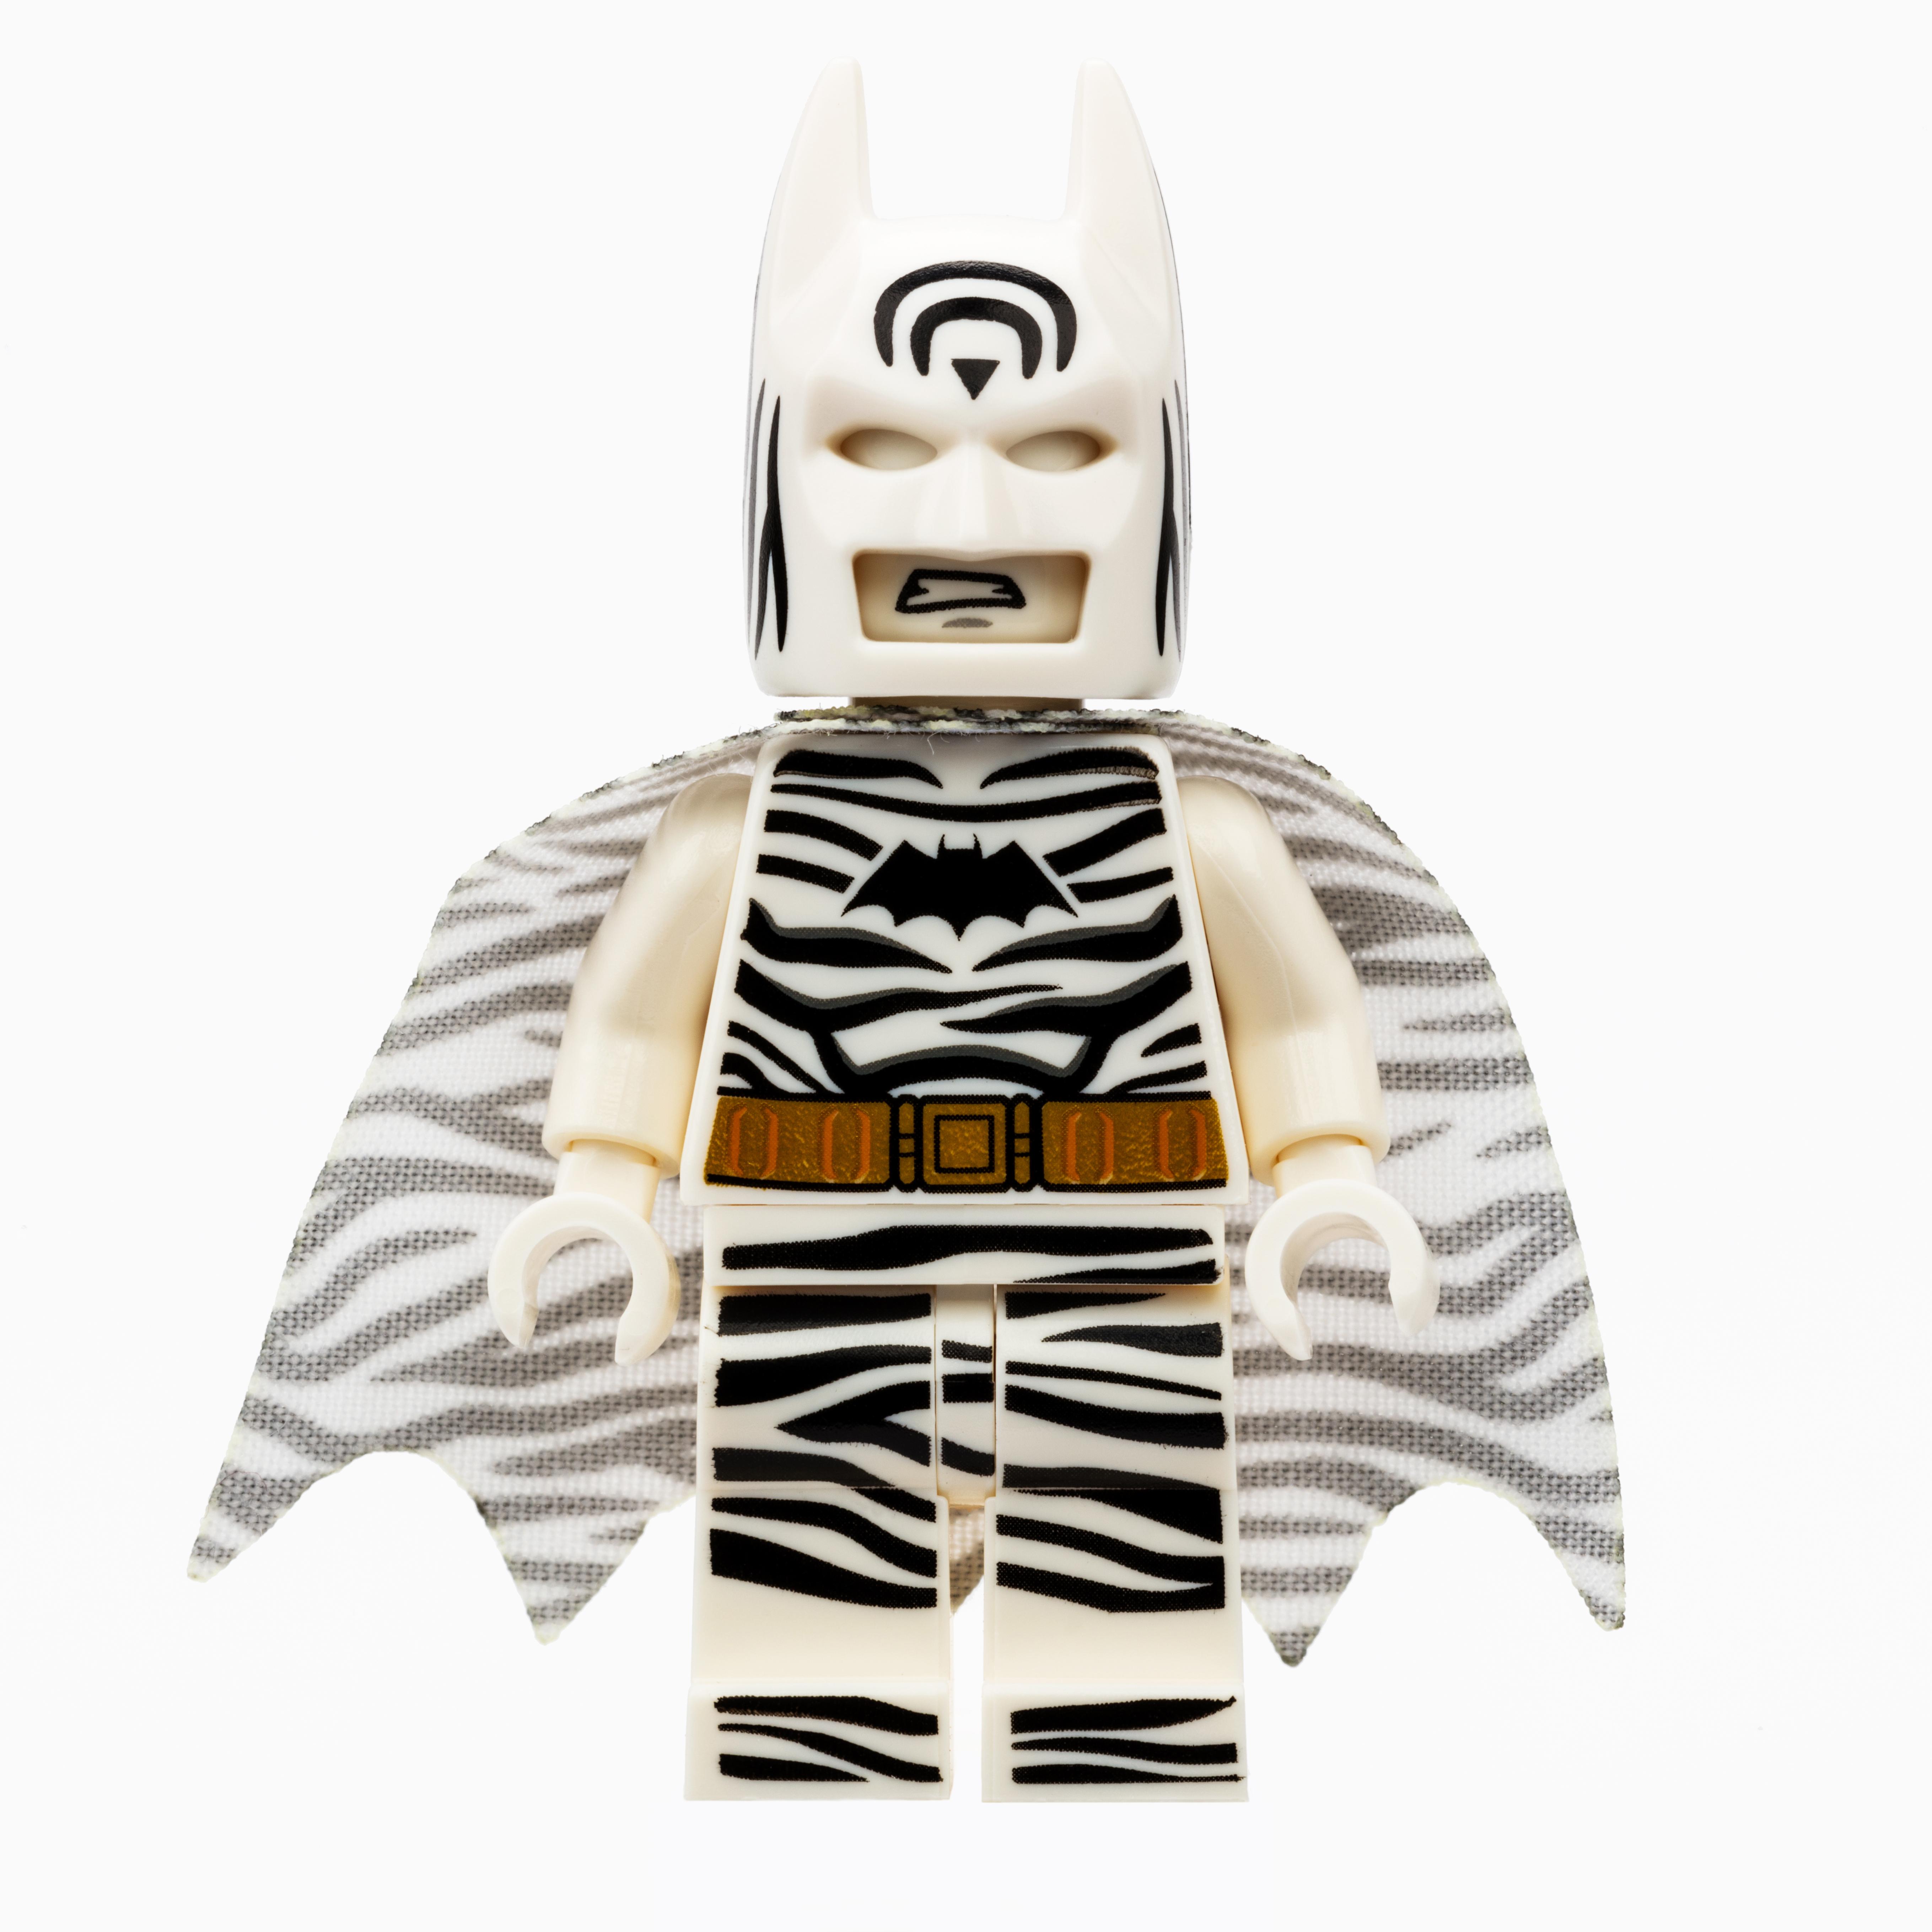 LEGO-SDCC2019-Zebra-Batman